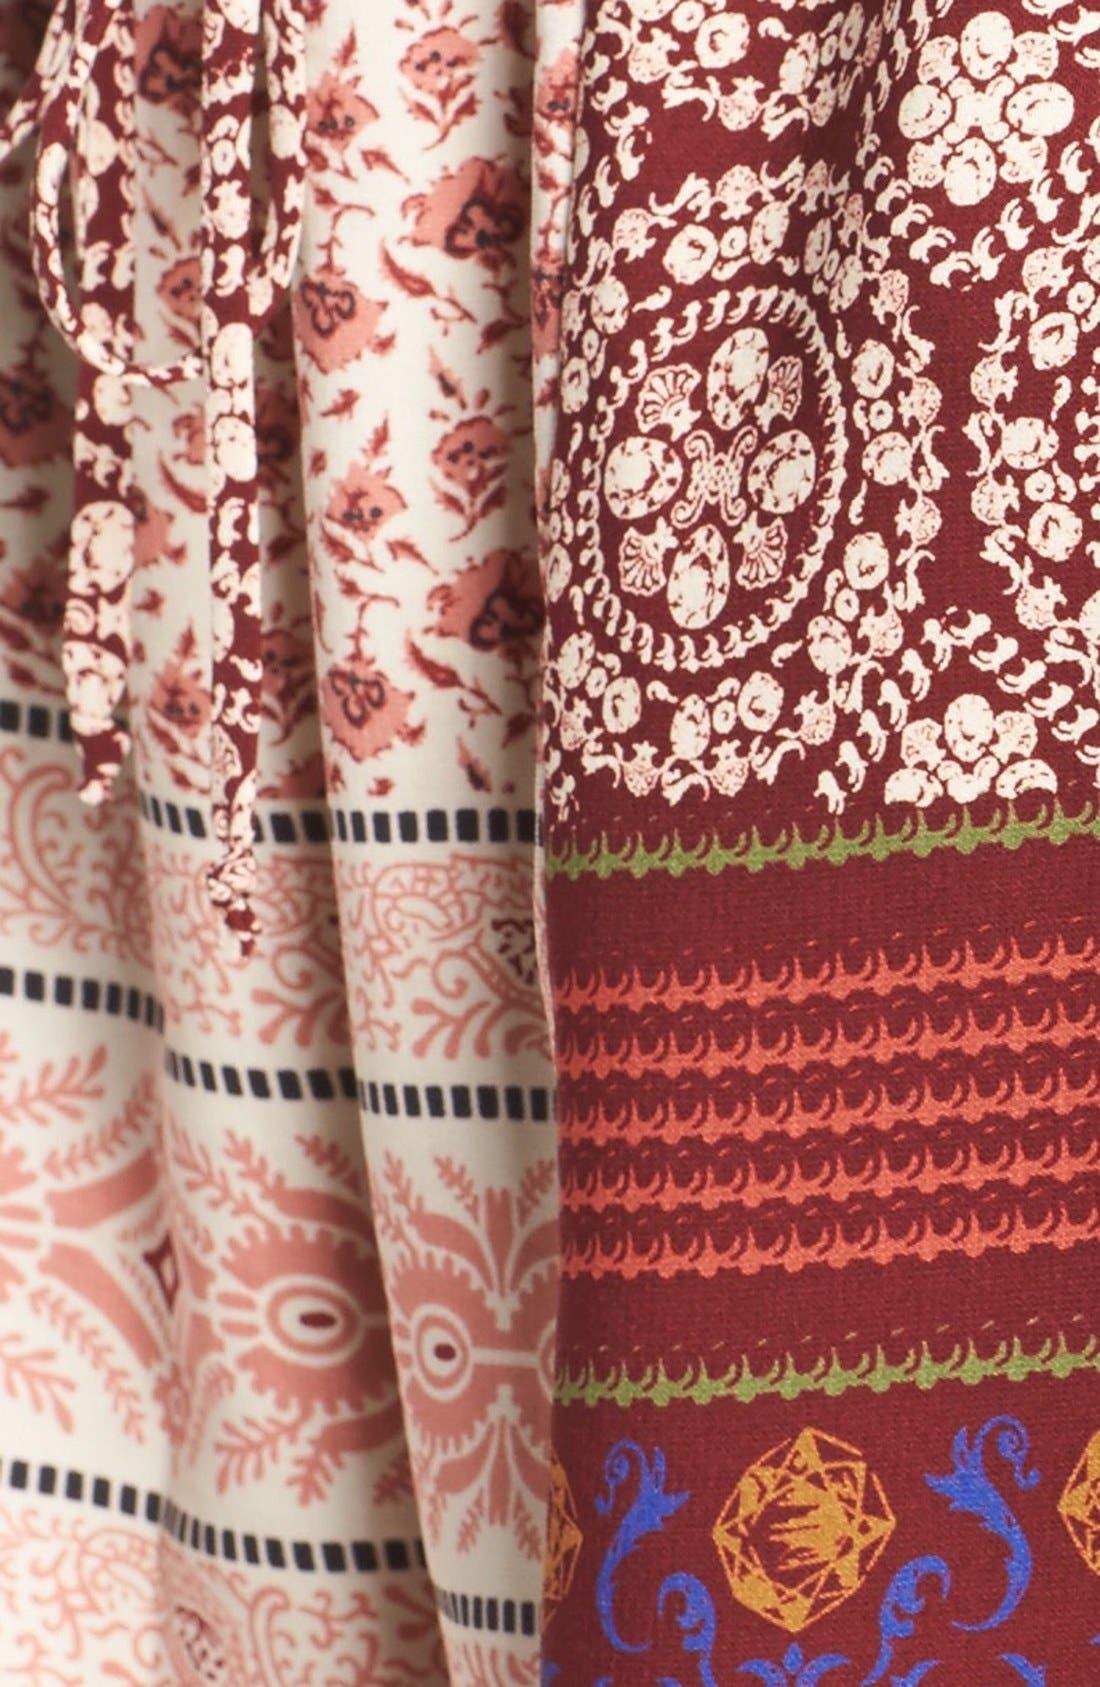 'Madison' Print Surplice Tie Waist Romper,                             Alternate thumbnail 5, color,                             937